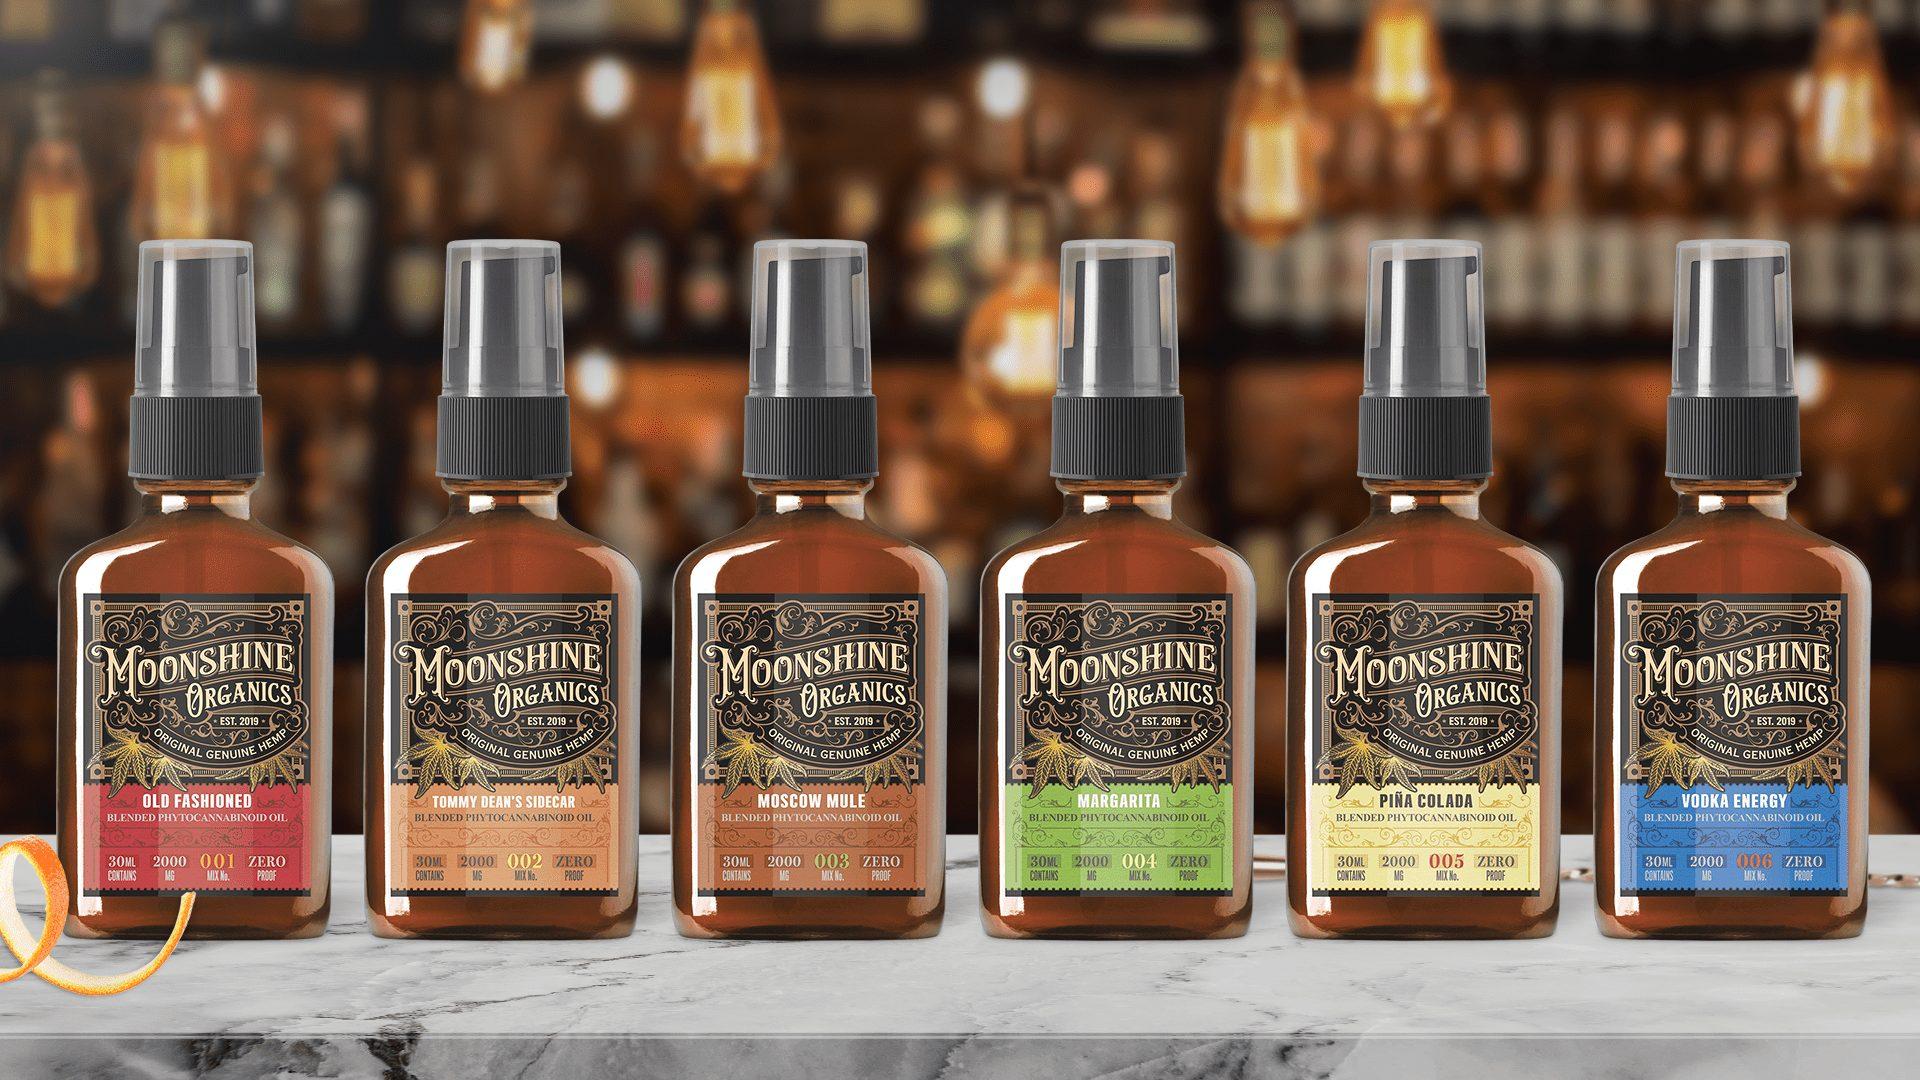 Moonshine Organics Home 1920x1080